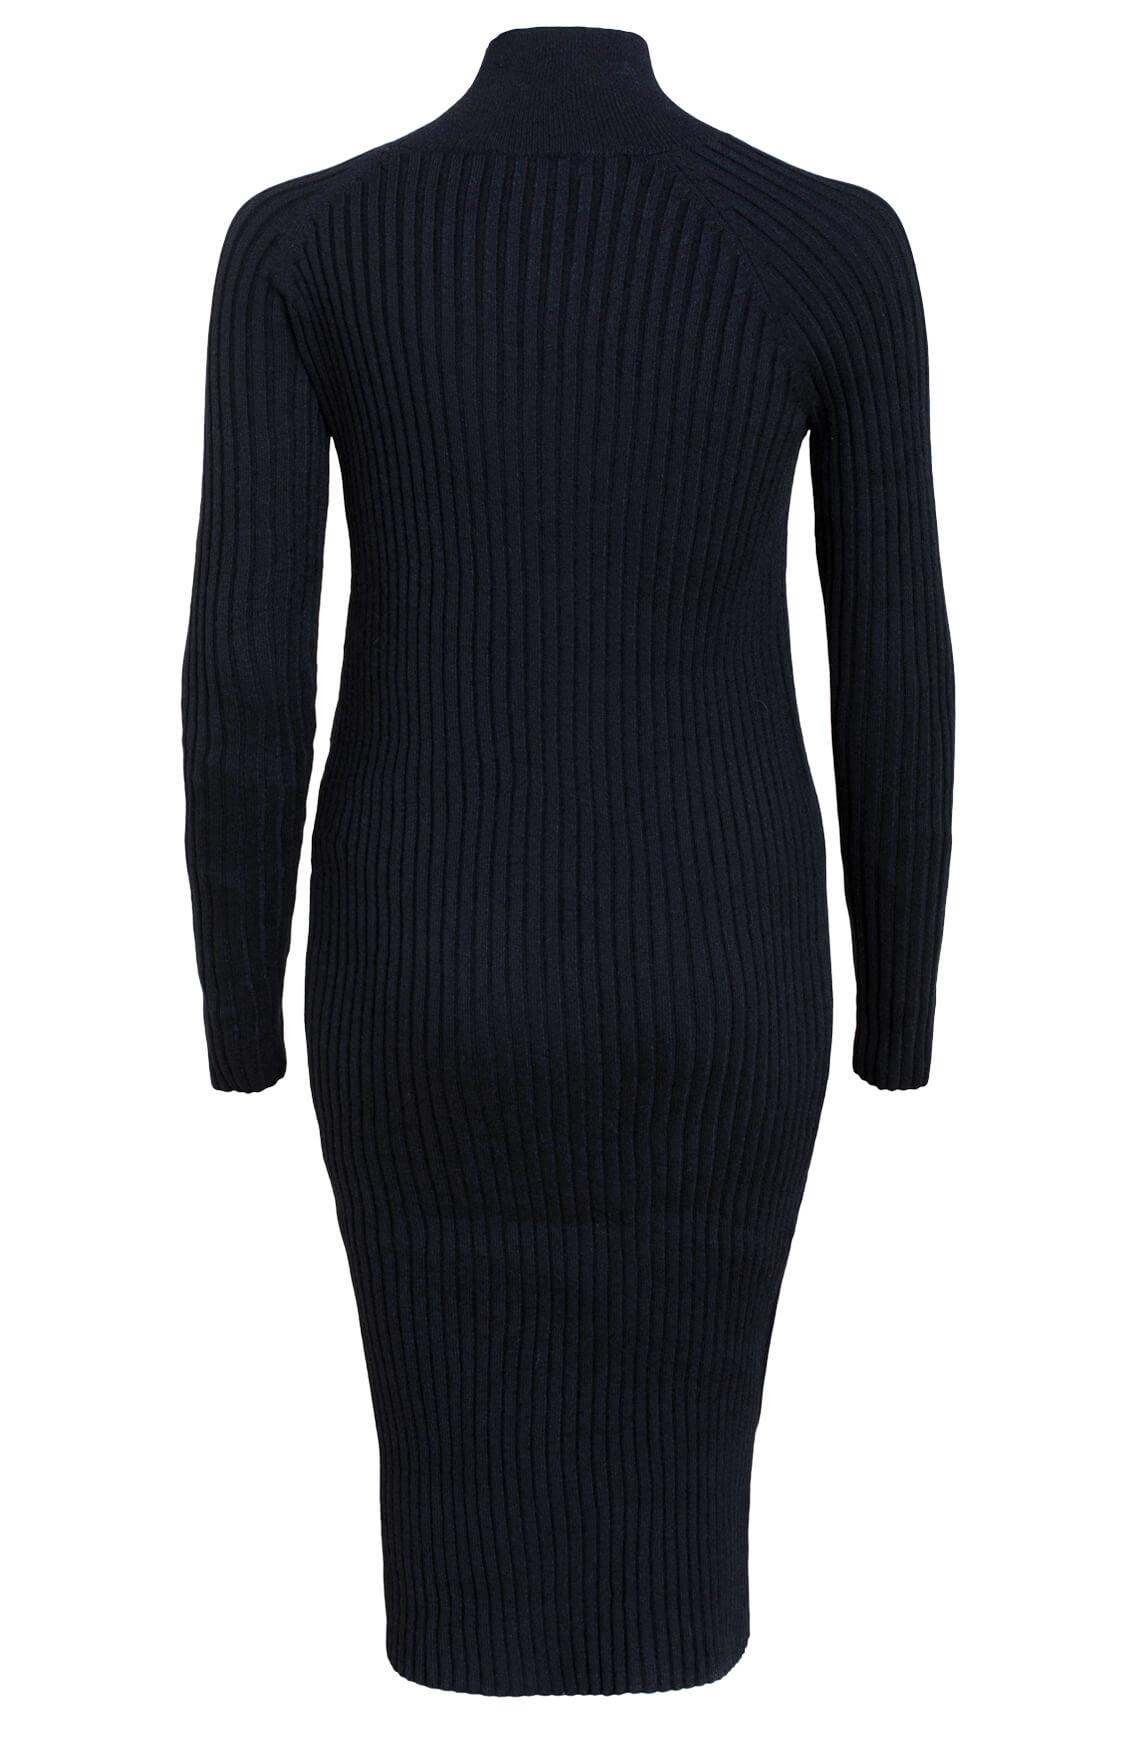 Moss Copenhagen Dames Joye Erica gebreide jurk zwart